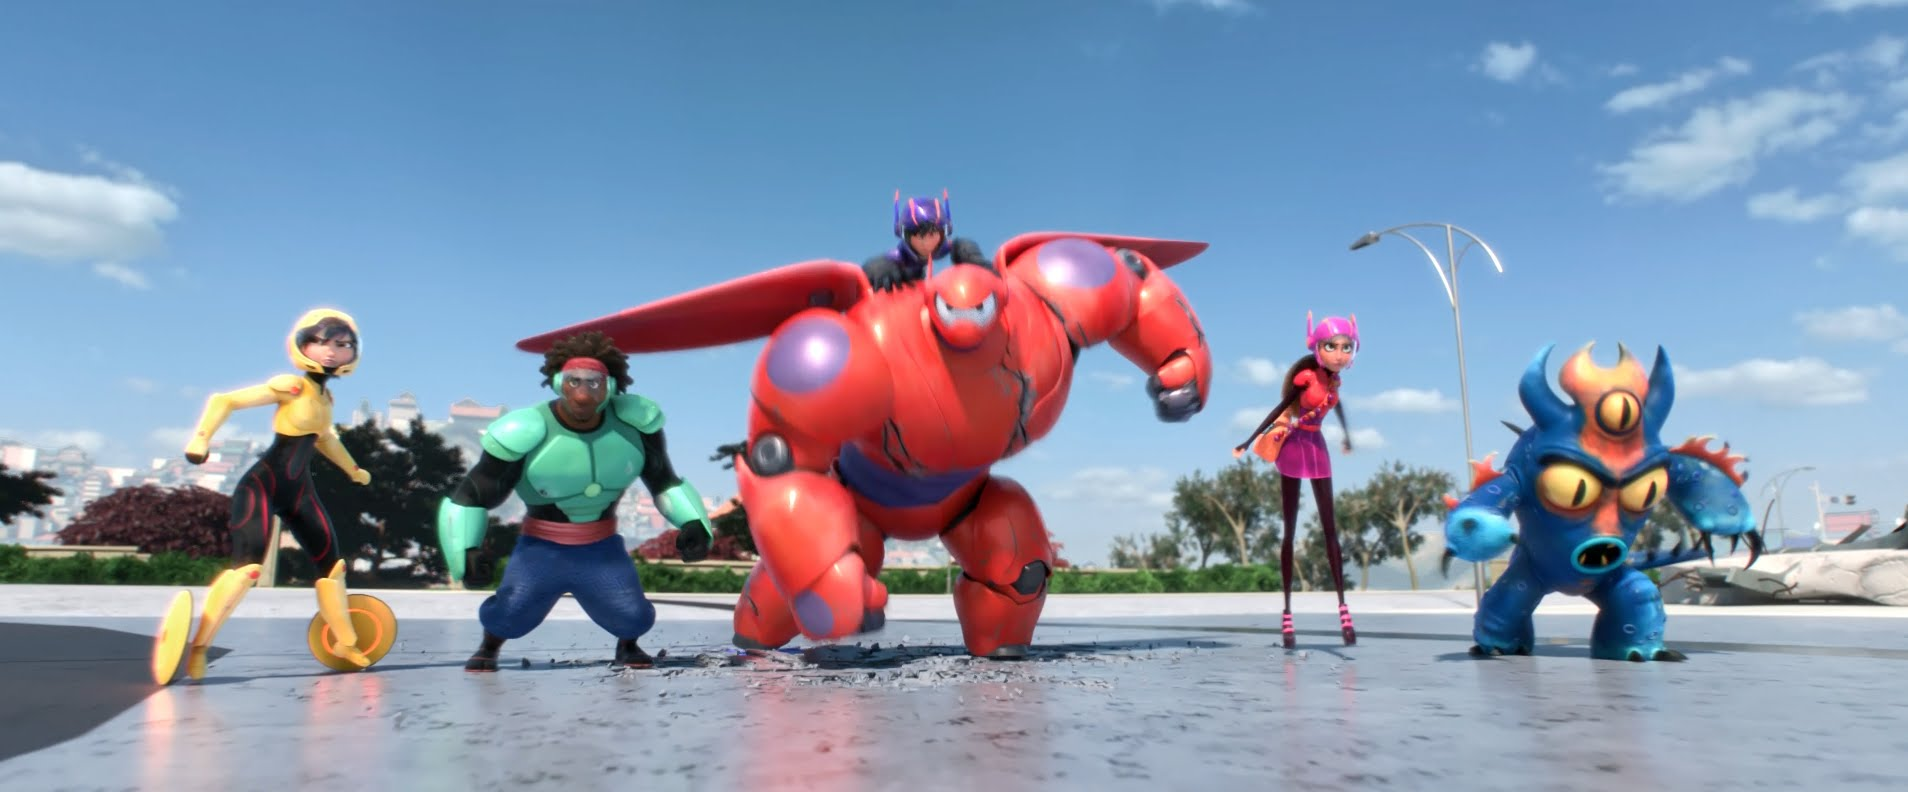 Download Big Hero 6 Hollywood bluray movie 2014